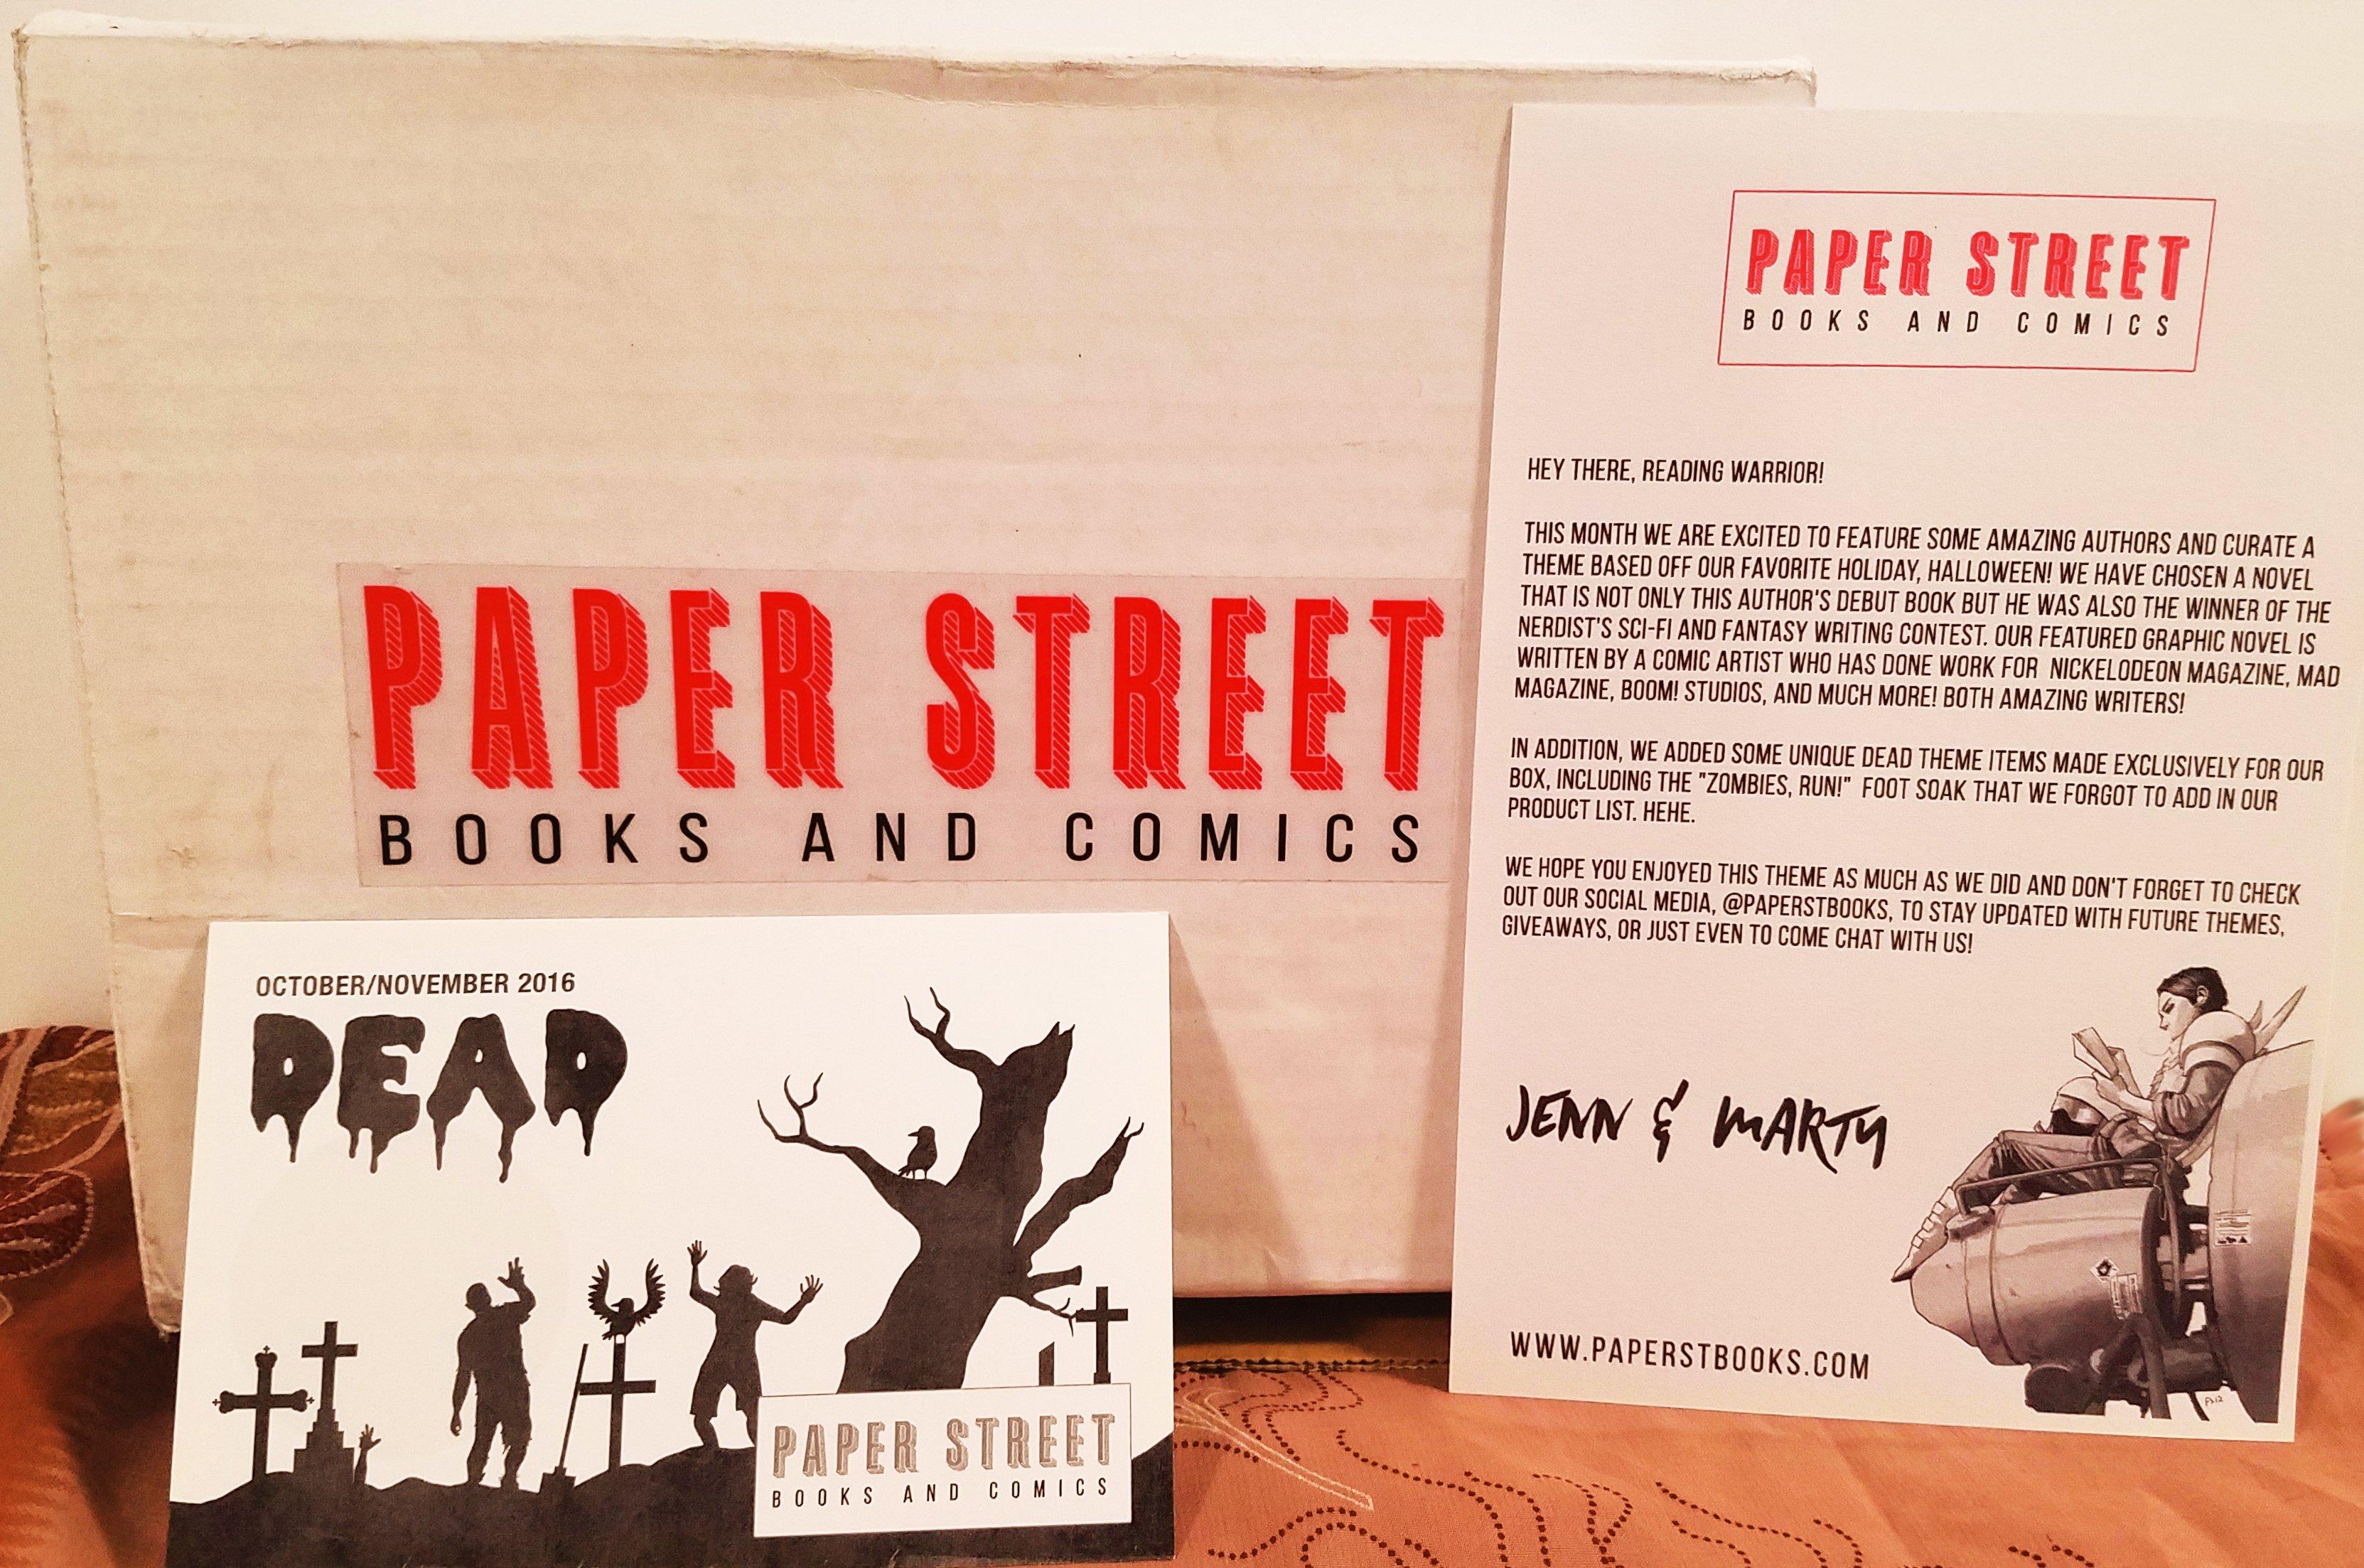 Paper Street Books & Comics- October/November 2016